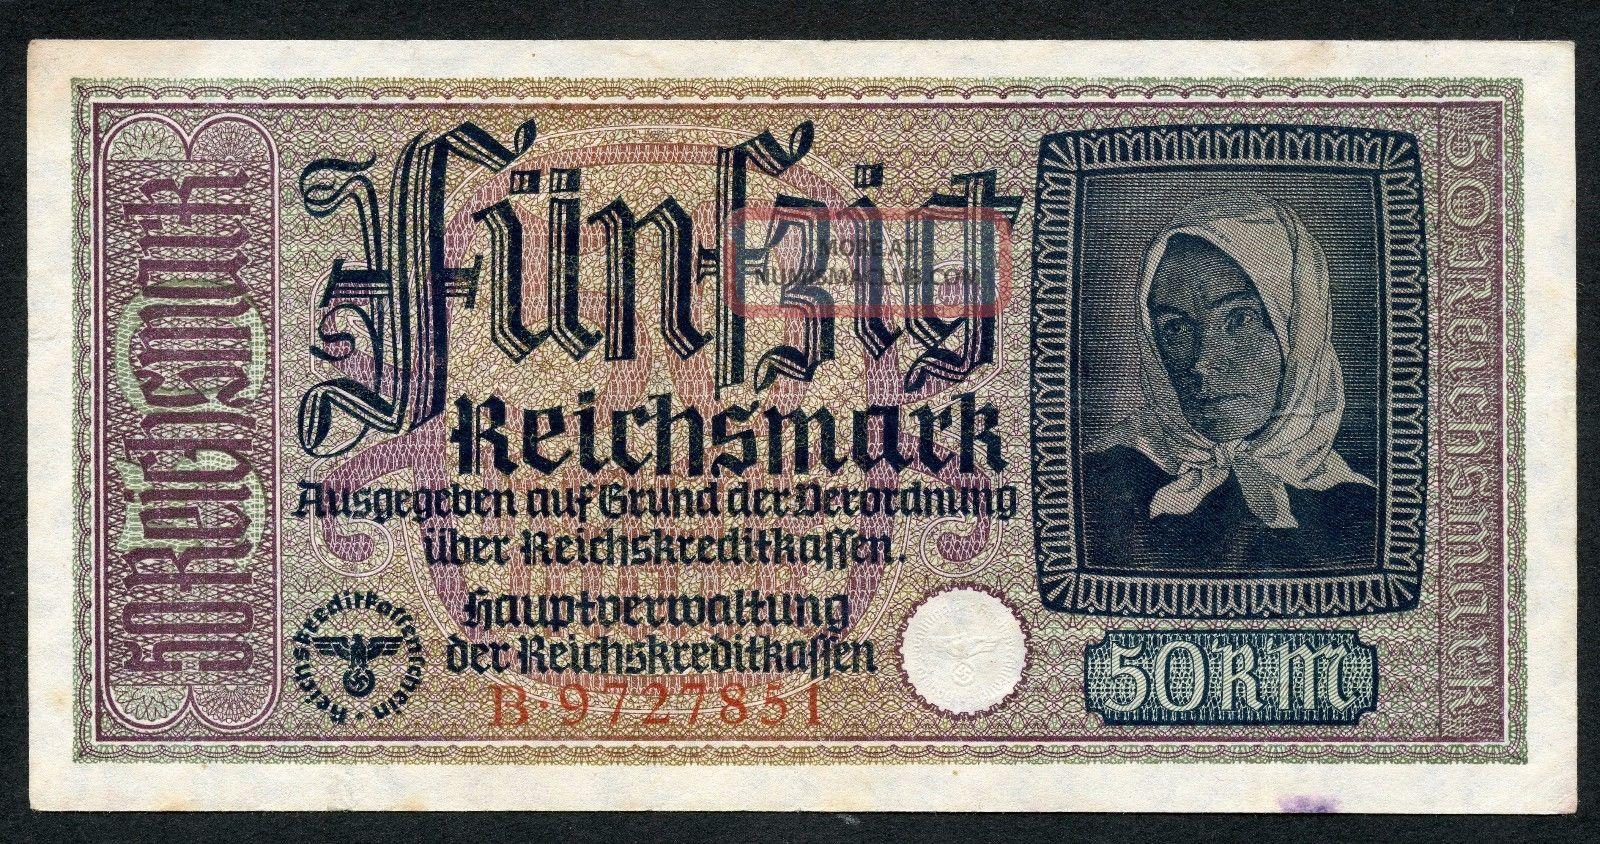 Germany Ww2 50 Reichsmark 1940 - 1945 Series B Vf Europe photo